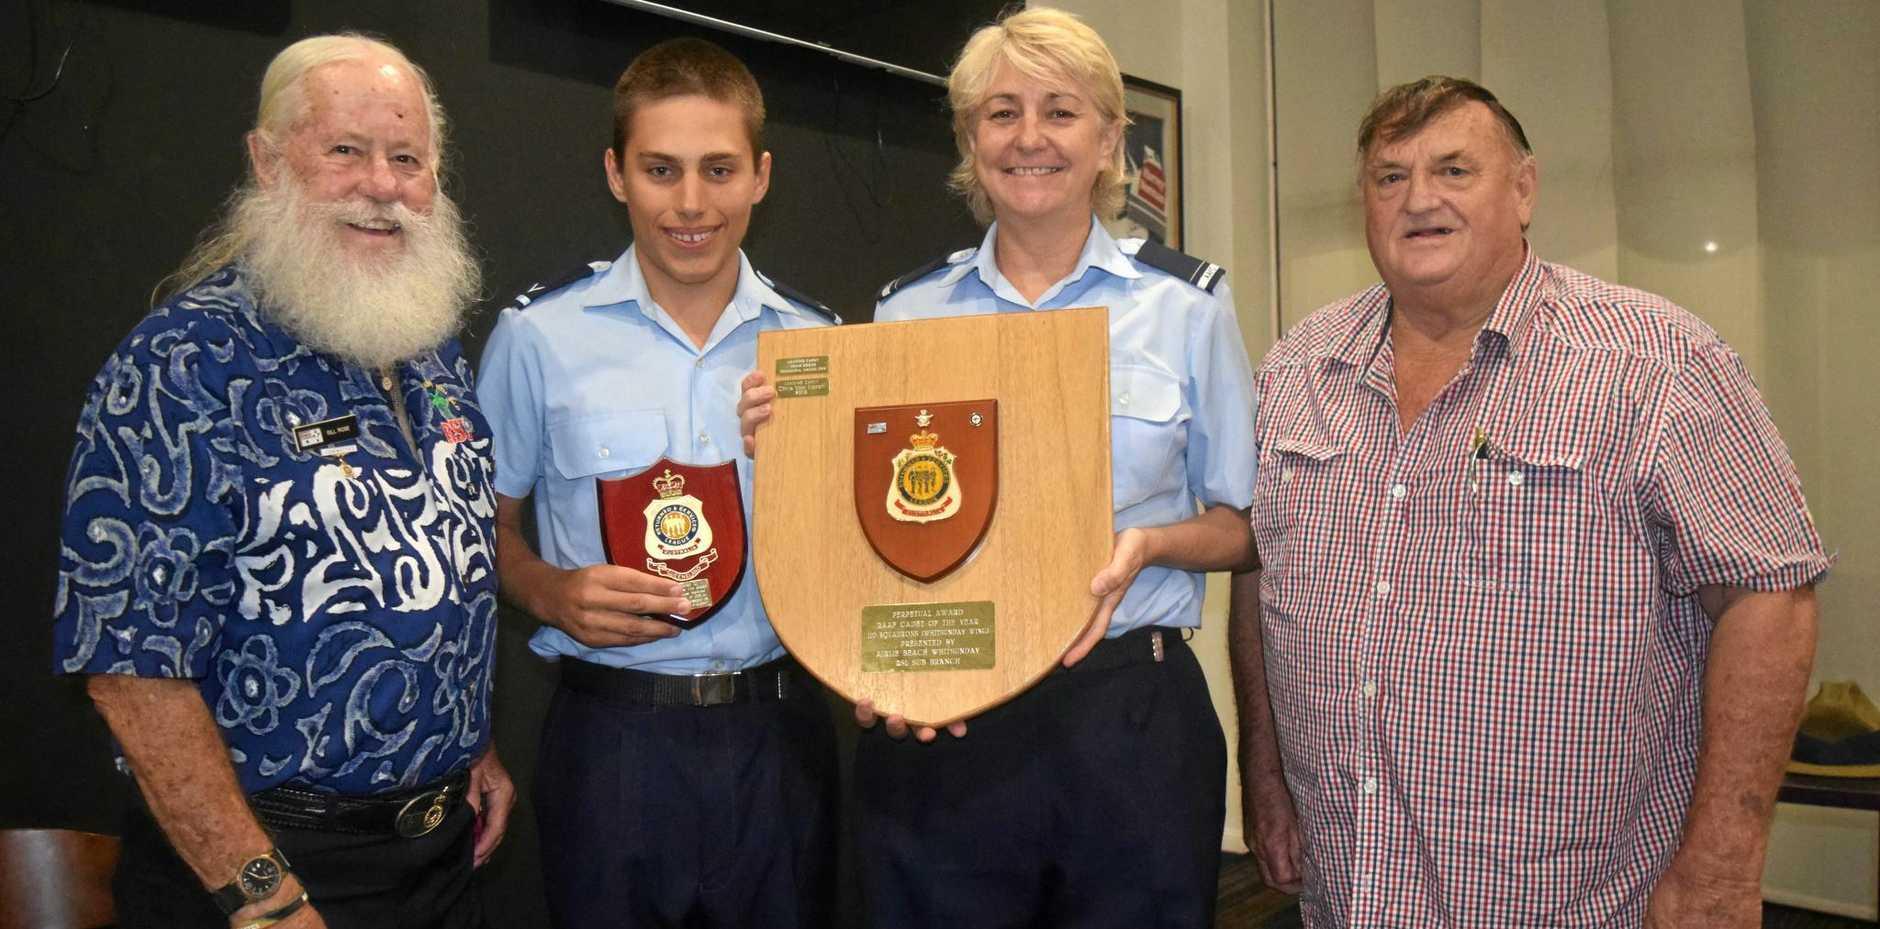 STANDOUT: Whitsunday/Airlie Beach RSL's Bill Rose and Chris Bull (right) with award winner Chris Von Eitzen and AAFC Pilot Officer Michelle Brayford.